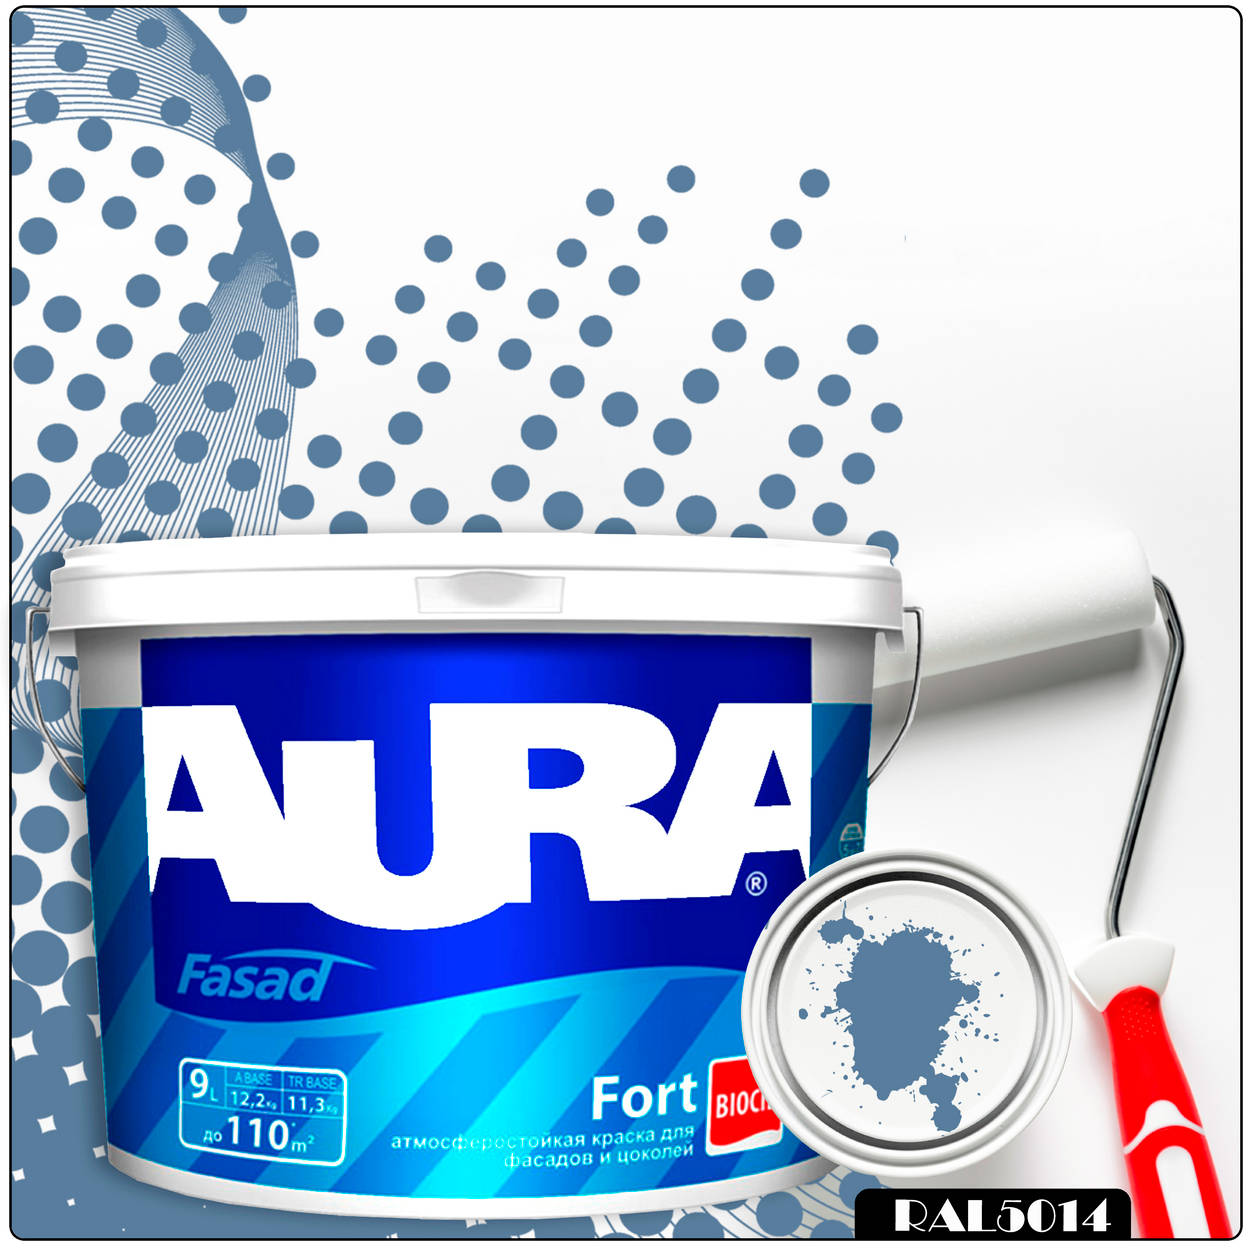 Фото 14 - Краска Aura Fasad Fort, RAL 5014 Голубино-синий, латексная, матовая, для фасада и цоколей, 9л, Аура.